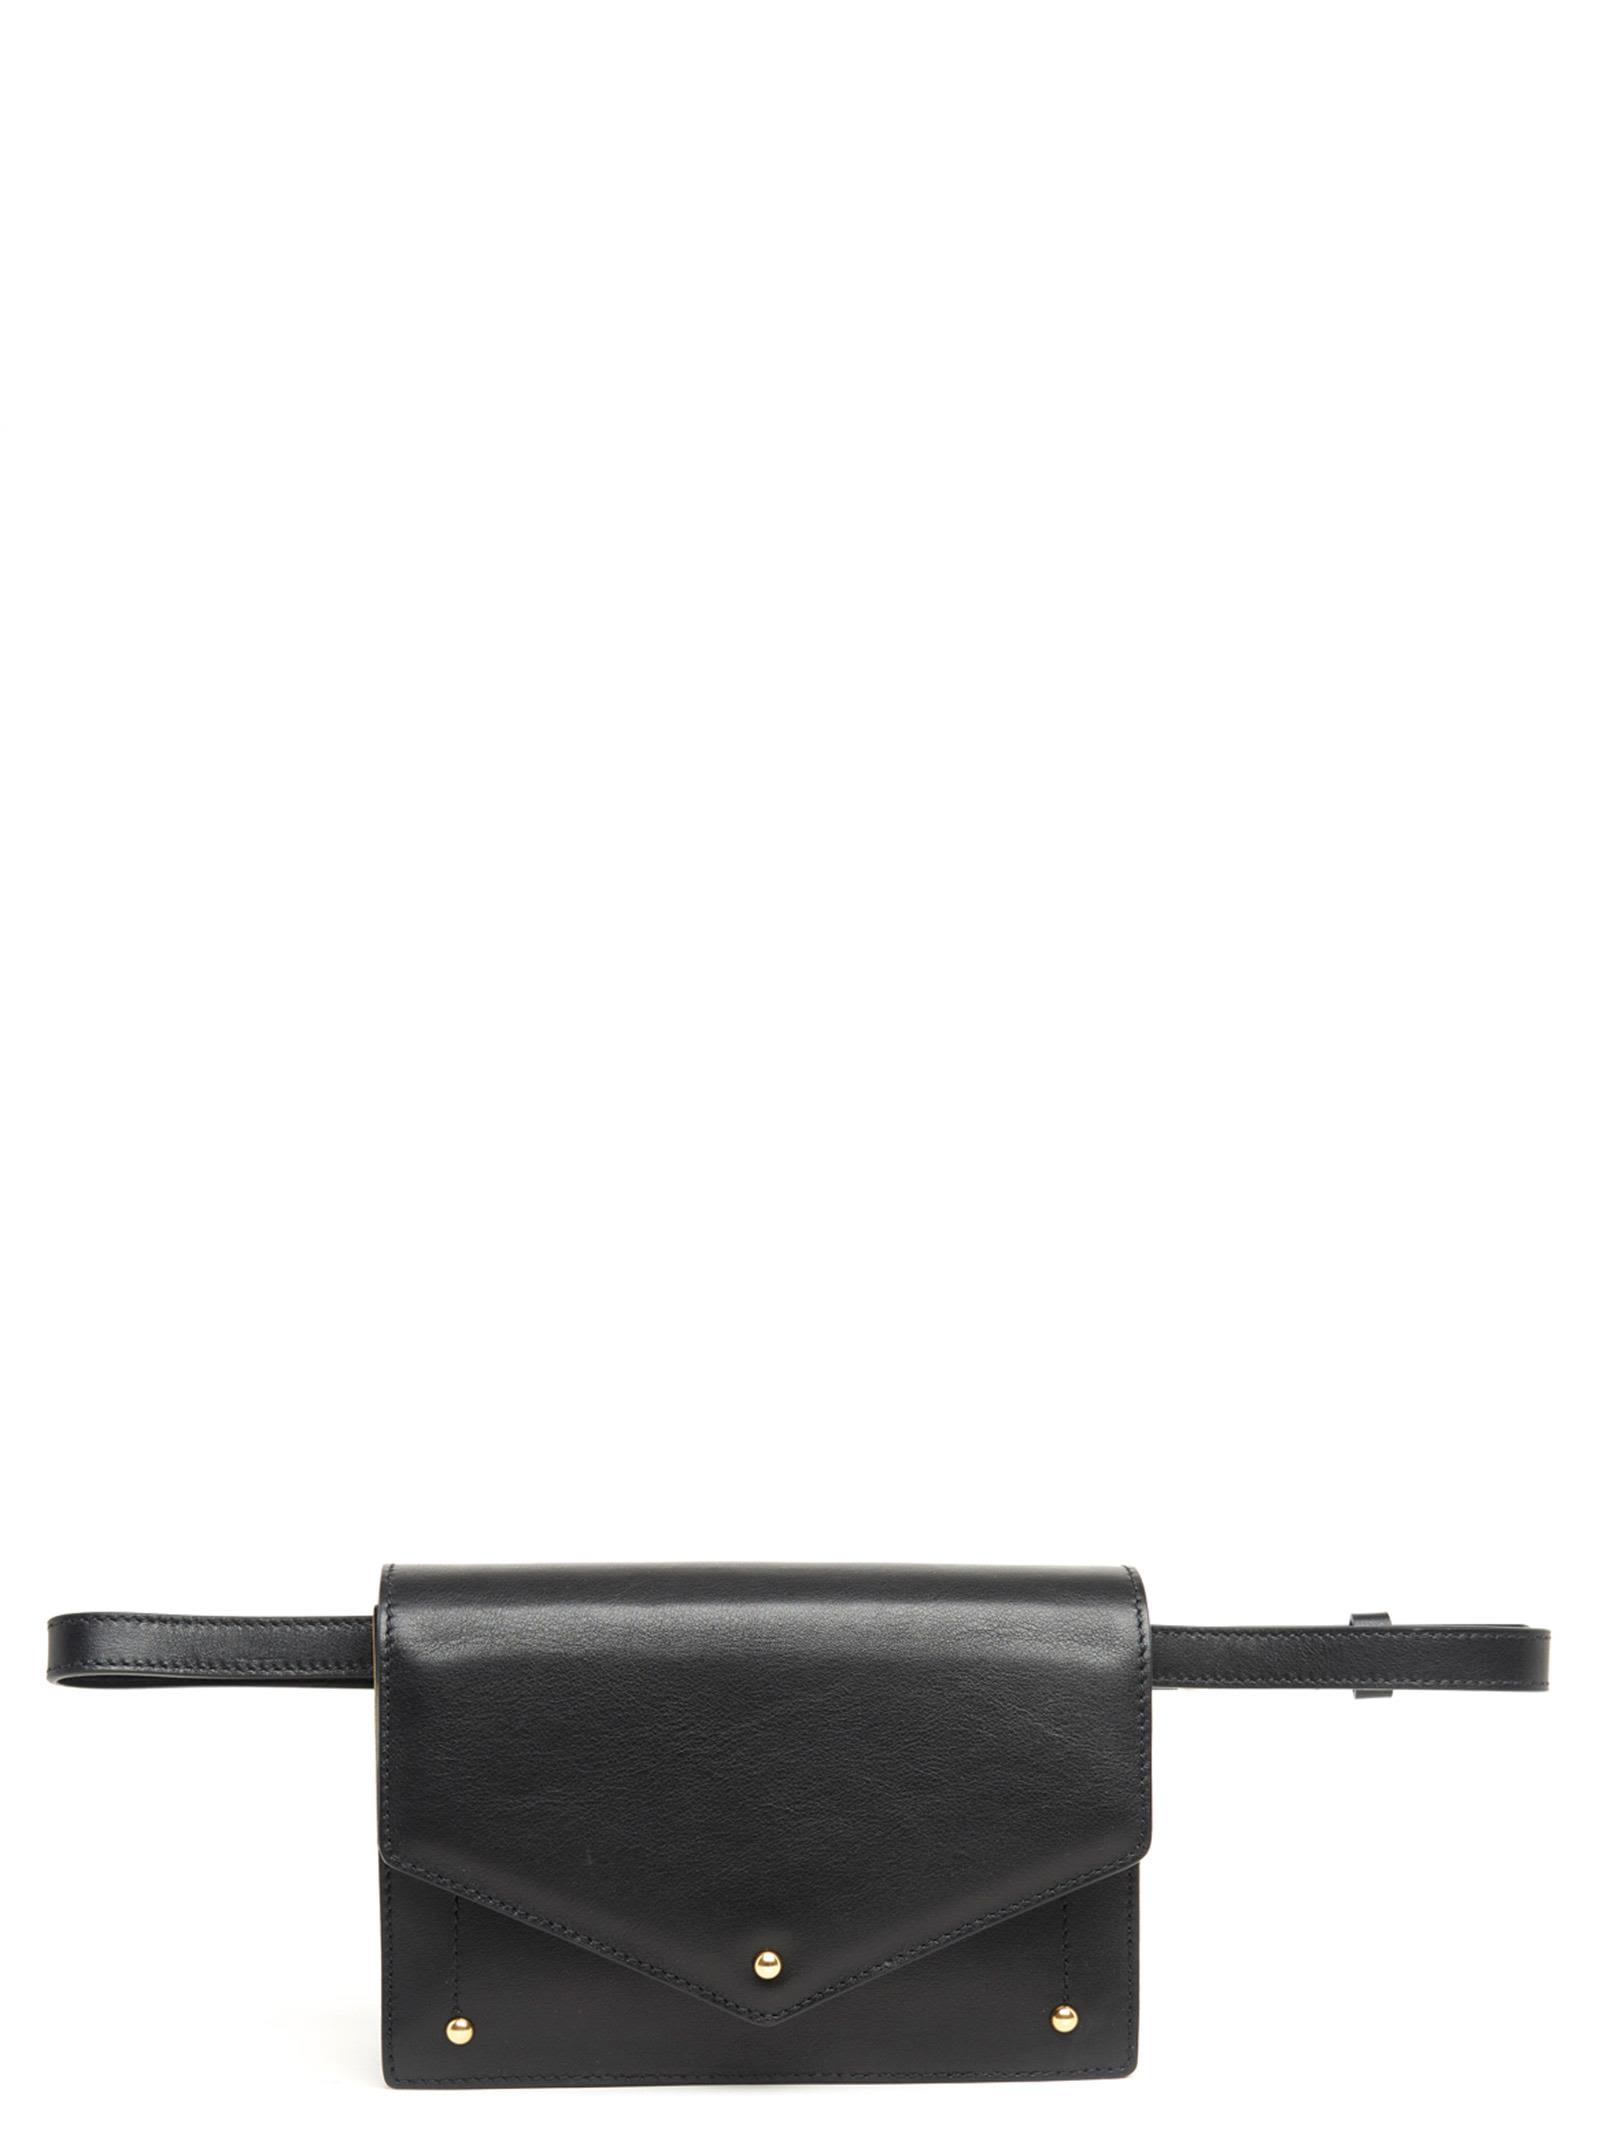 sara battaglia -  'plissè Clutch' Bag